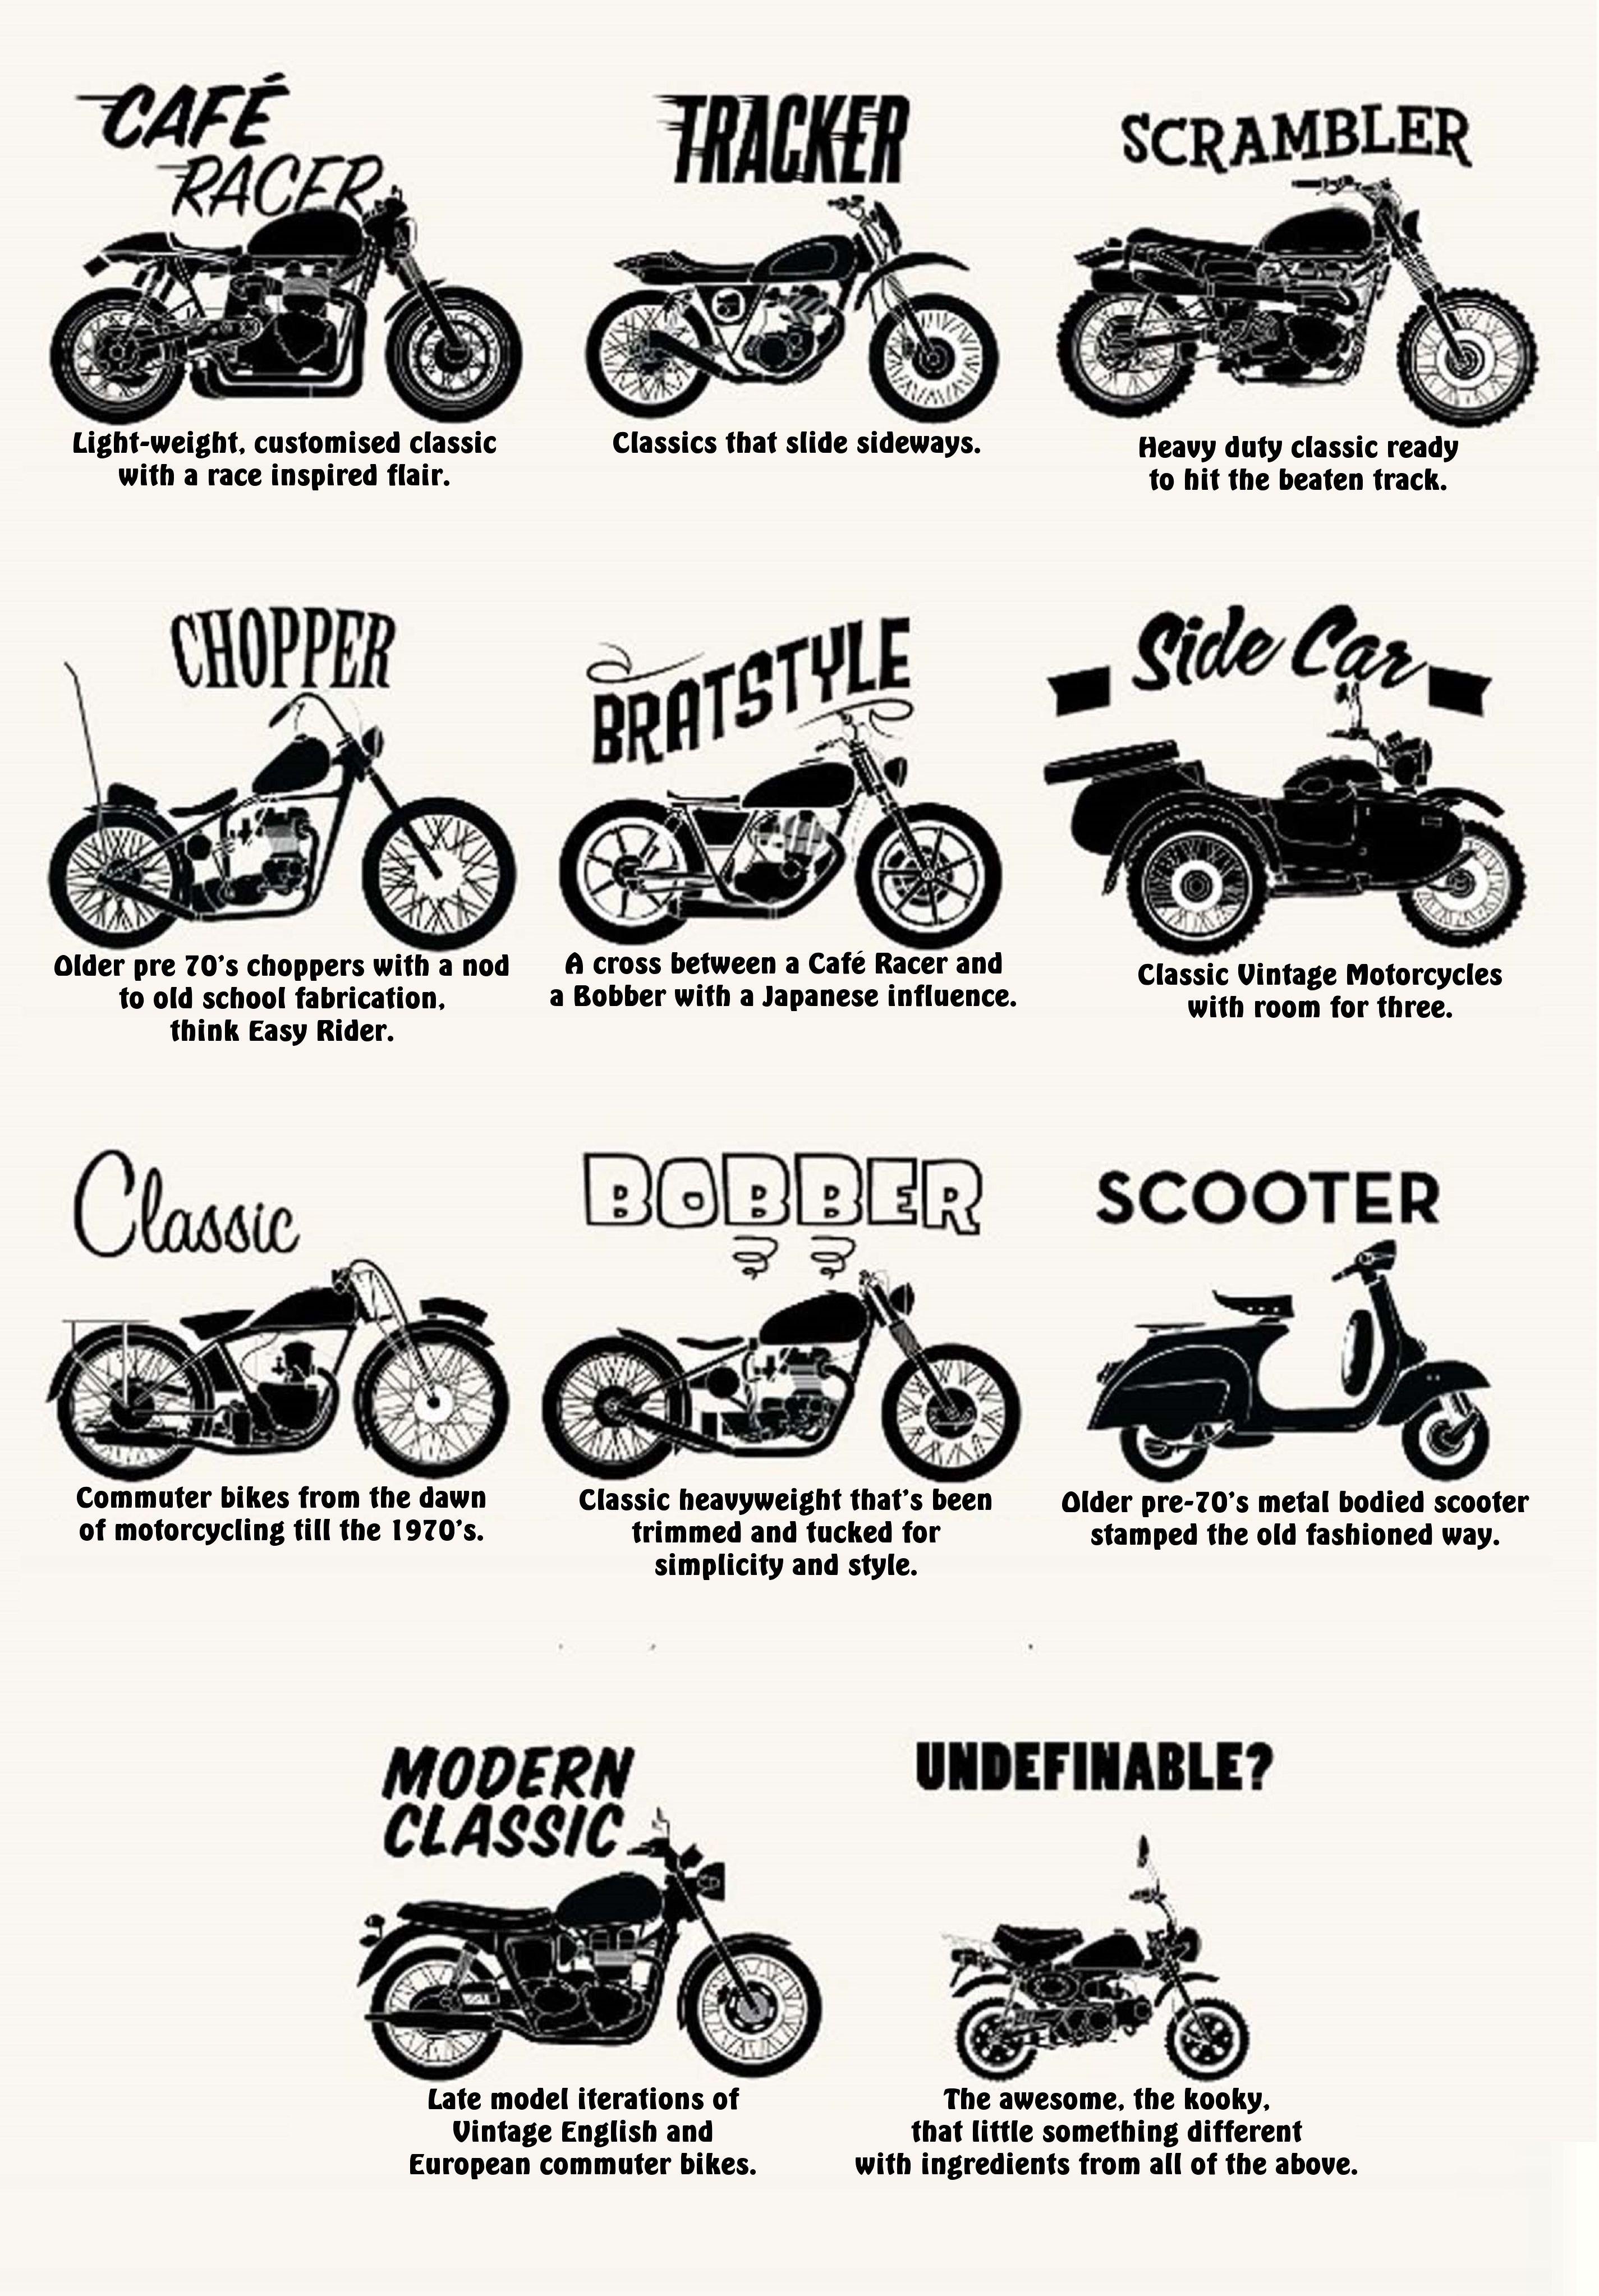 Motorcycle Types Webcachegoogleusercontent Searchqcache 162209103181 About Style Guidegws RdcreicUUjWPqvIeTLgAaNrq ABg